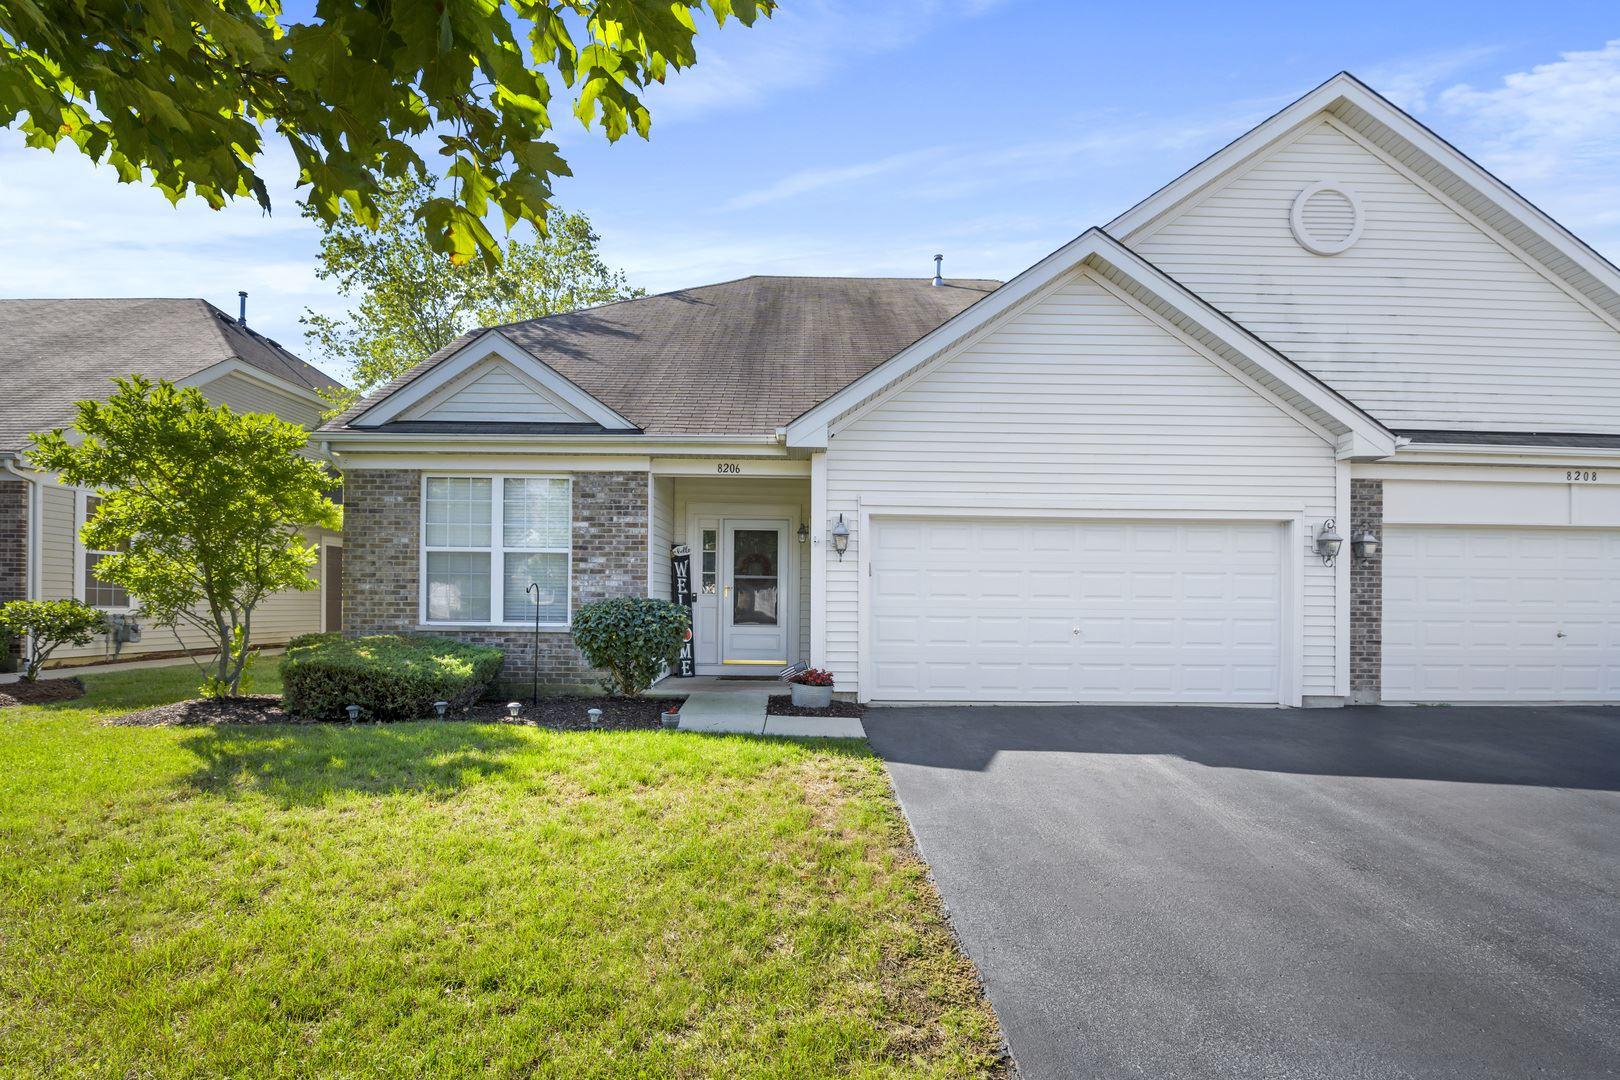 Photo of 8206 Woodview Avenue, Joliet, IL 60431 (MLS # 10858733)